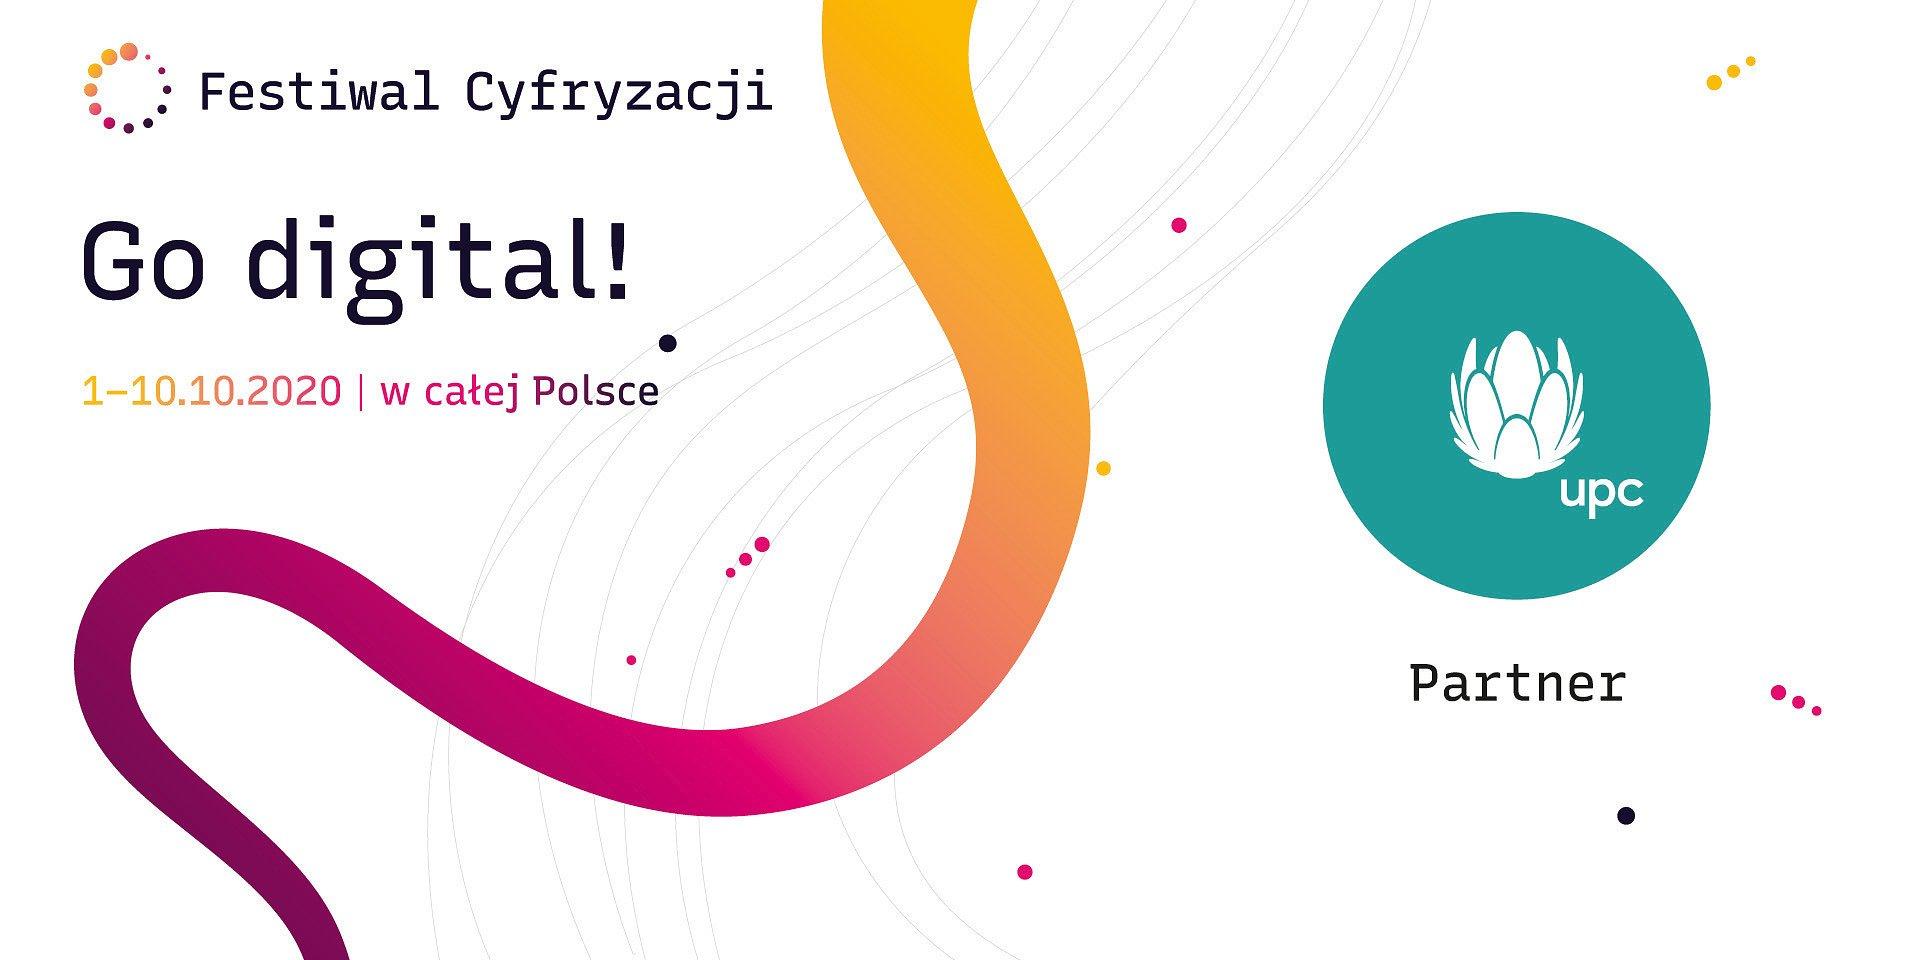 UPC Polska partnerem Festiwalu Cyfryzacji 2020